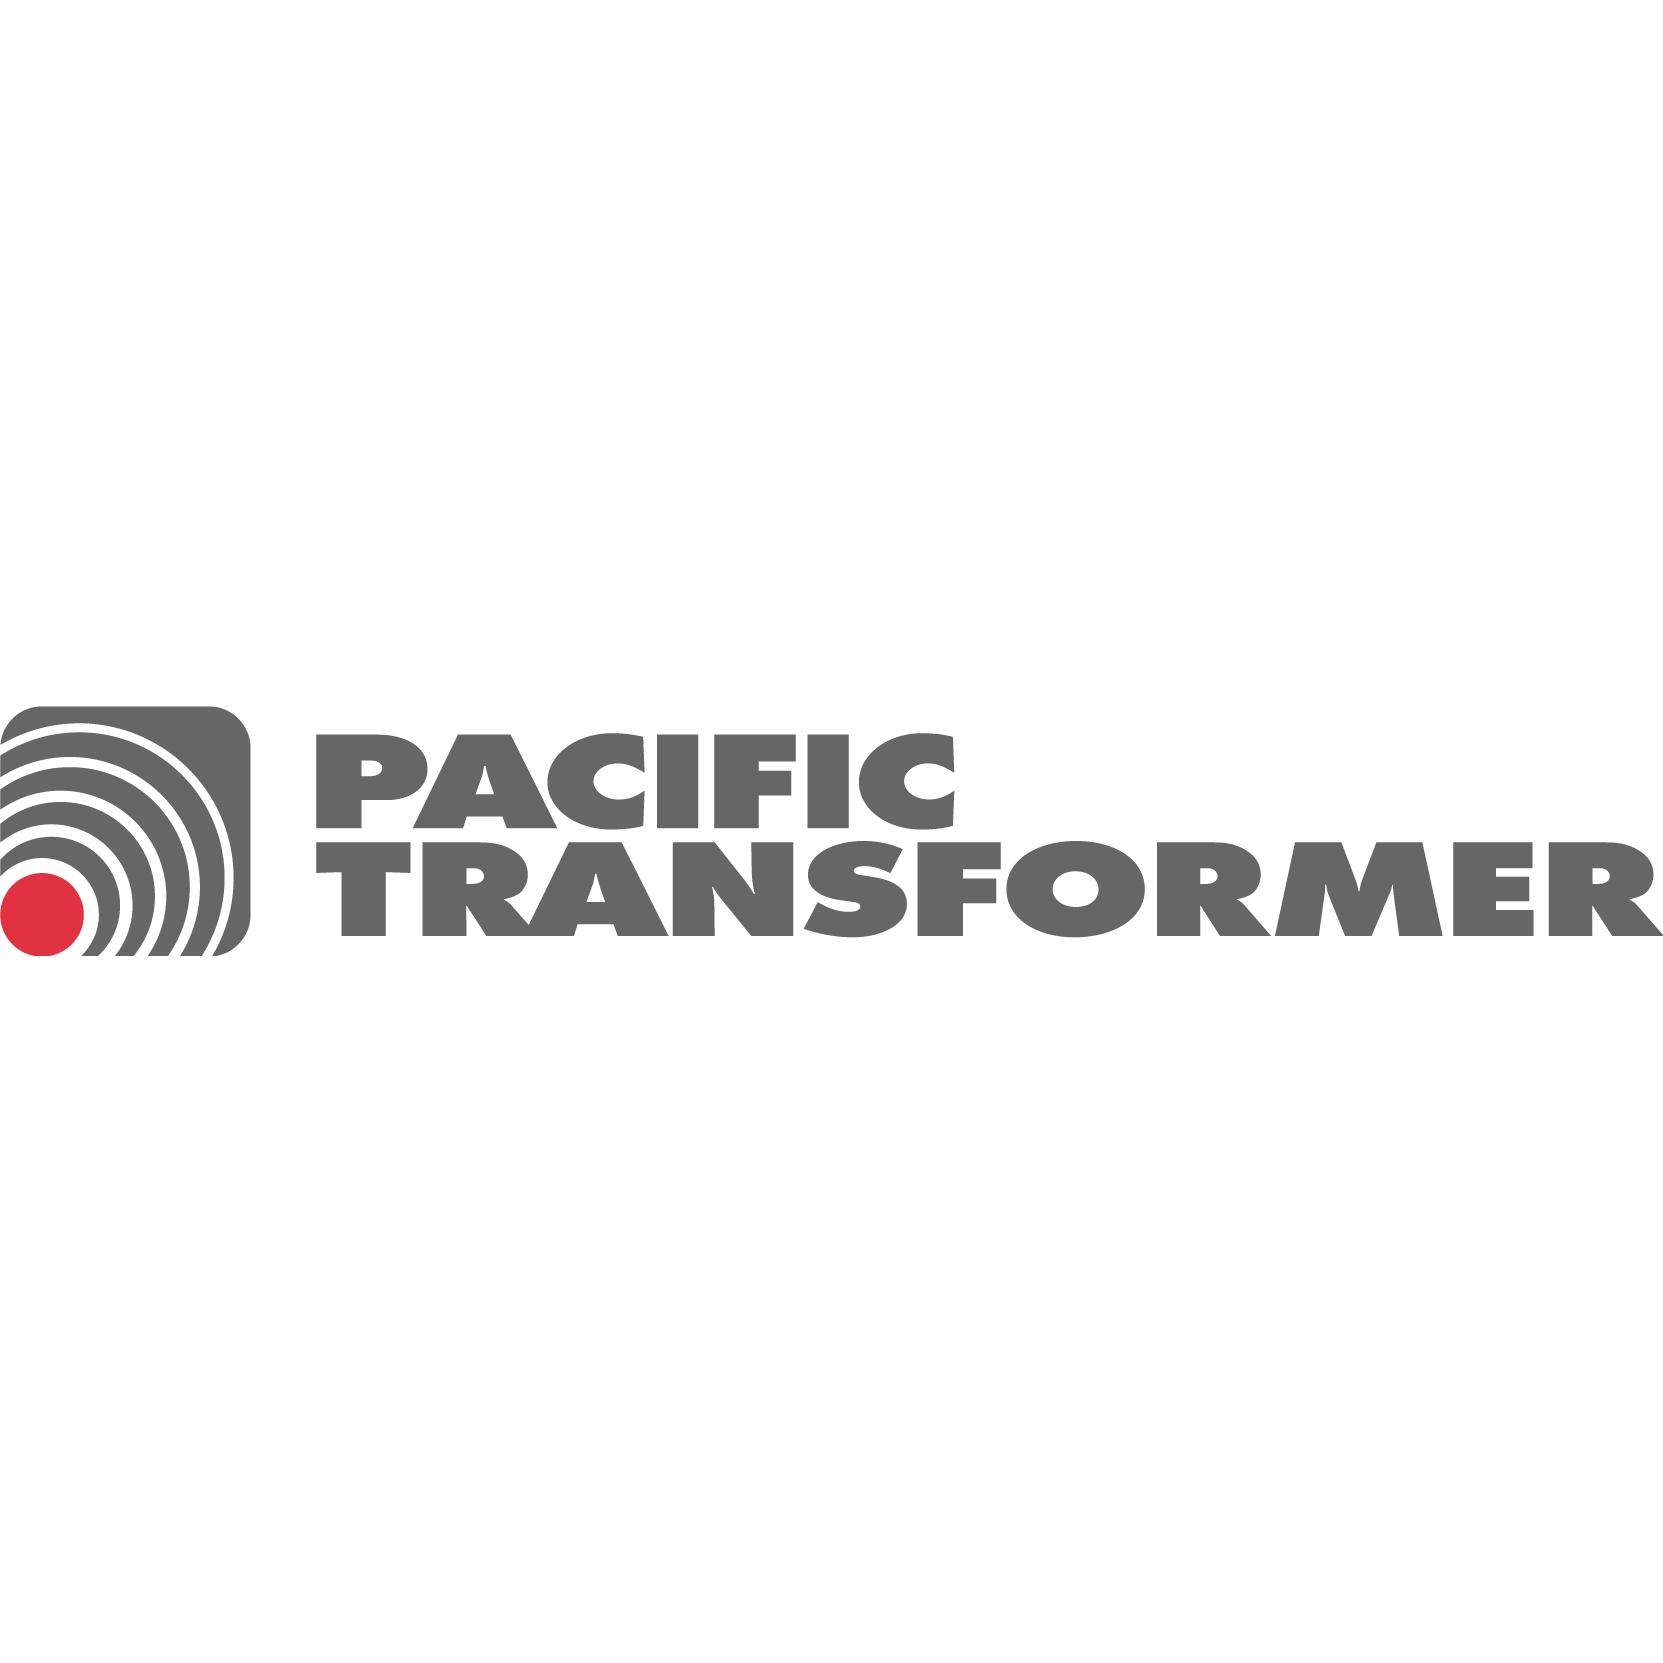 Pacific Transformer